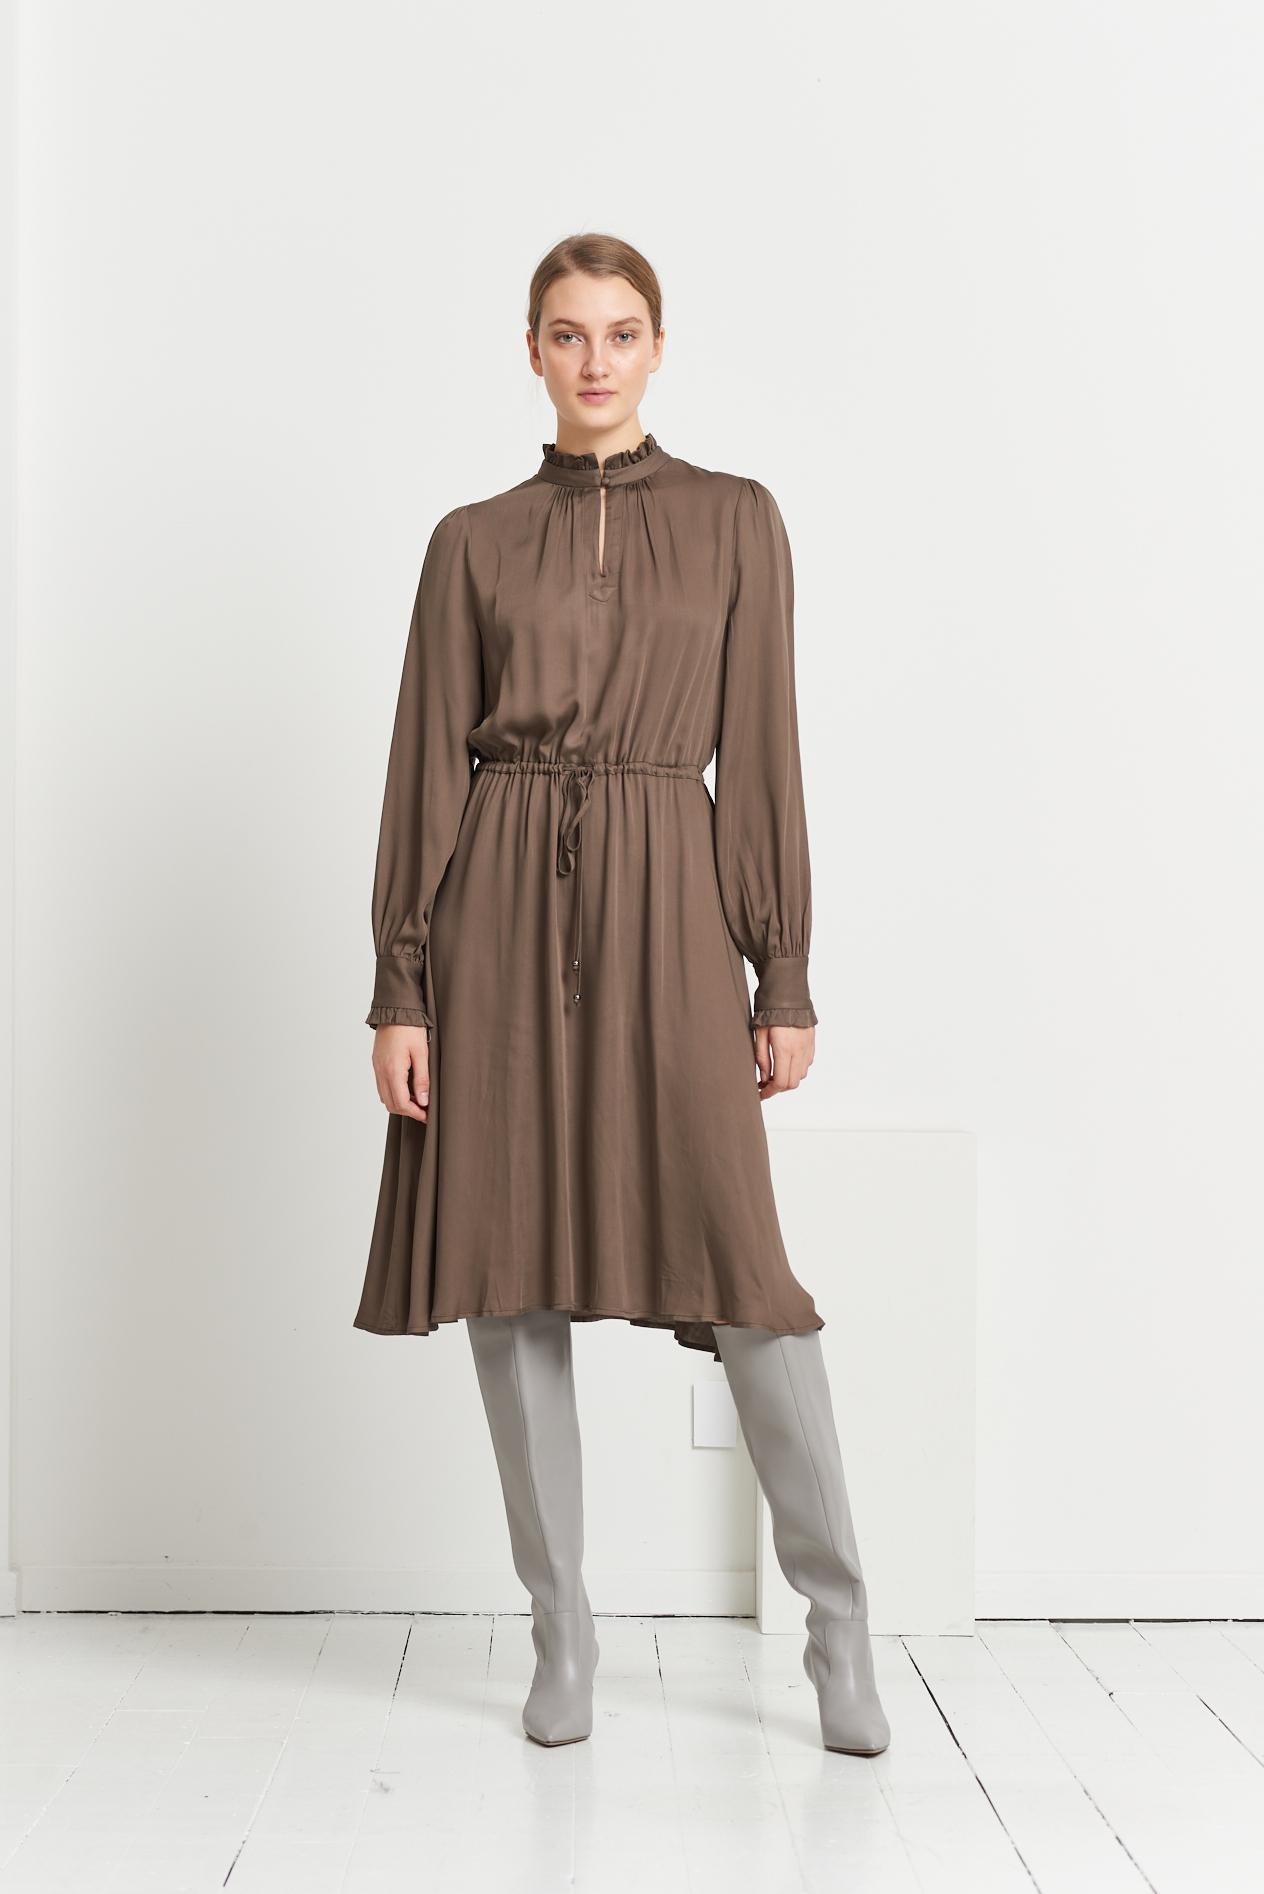 Bruuns Bazaar Bauma Tilda kjole, major brown, 44